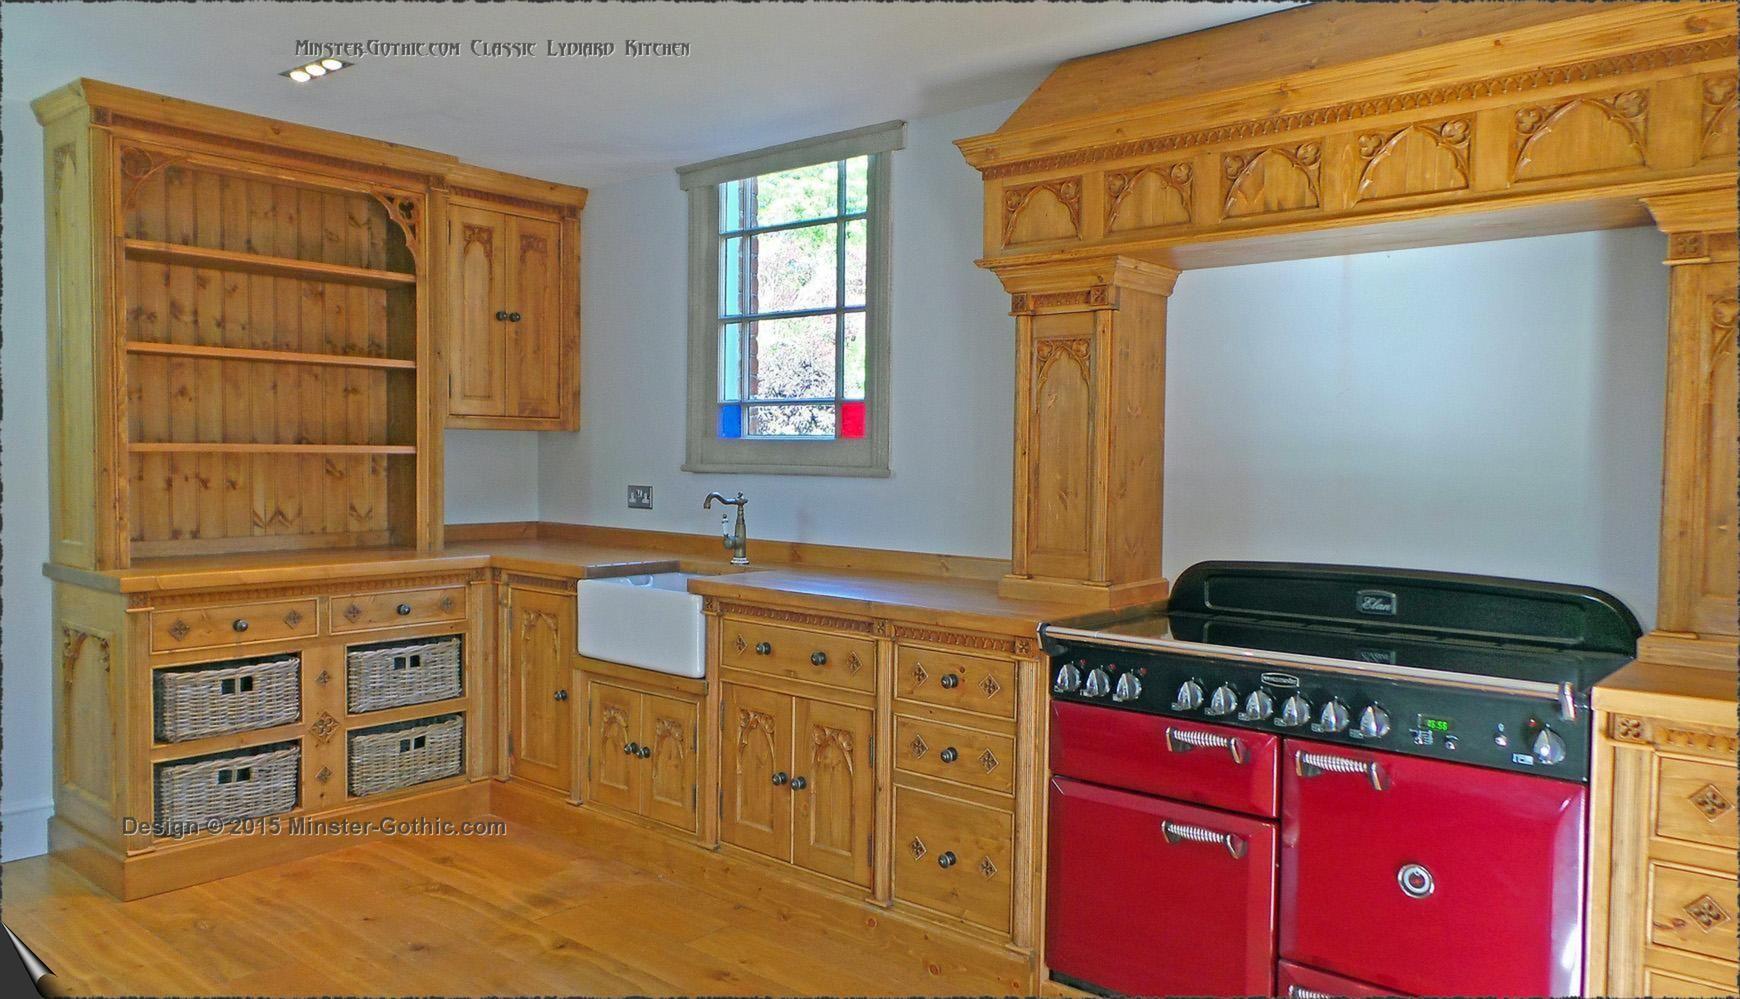 http://www.minster-gothic.com/files/xT_MGC-Lydiard-Kitchen ...